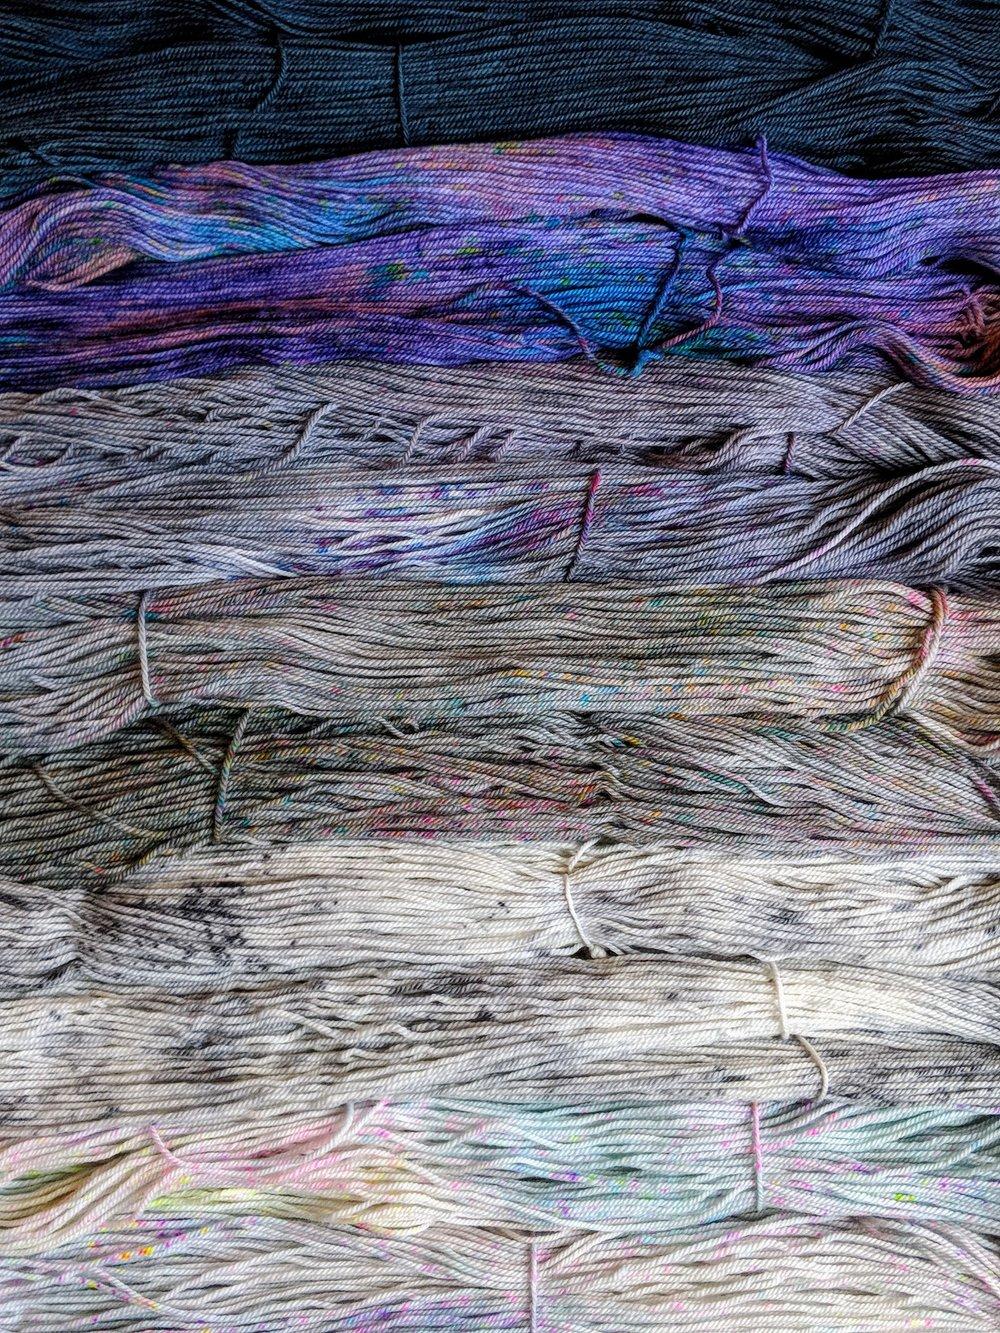 DTO Update Tanis Fiber Arts Pretty Purples!